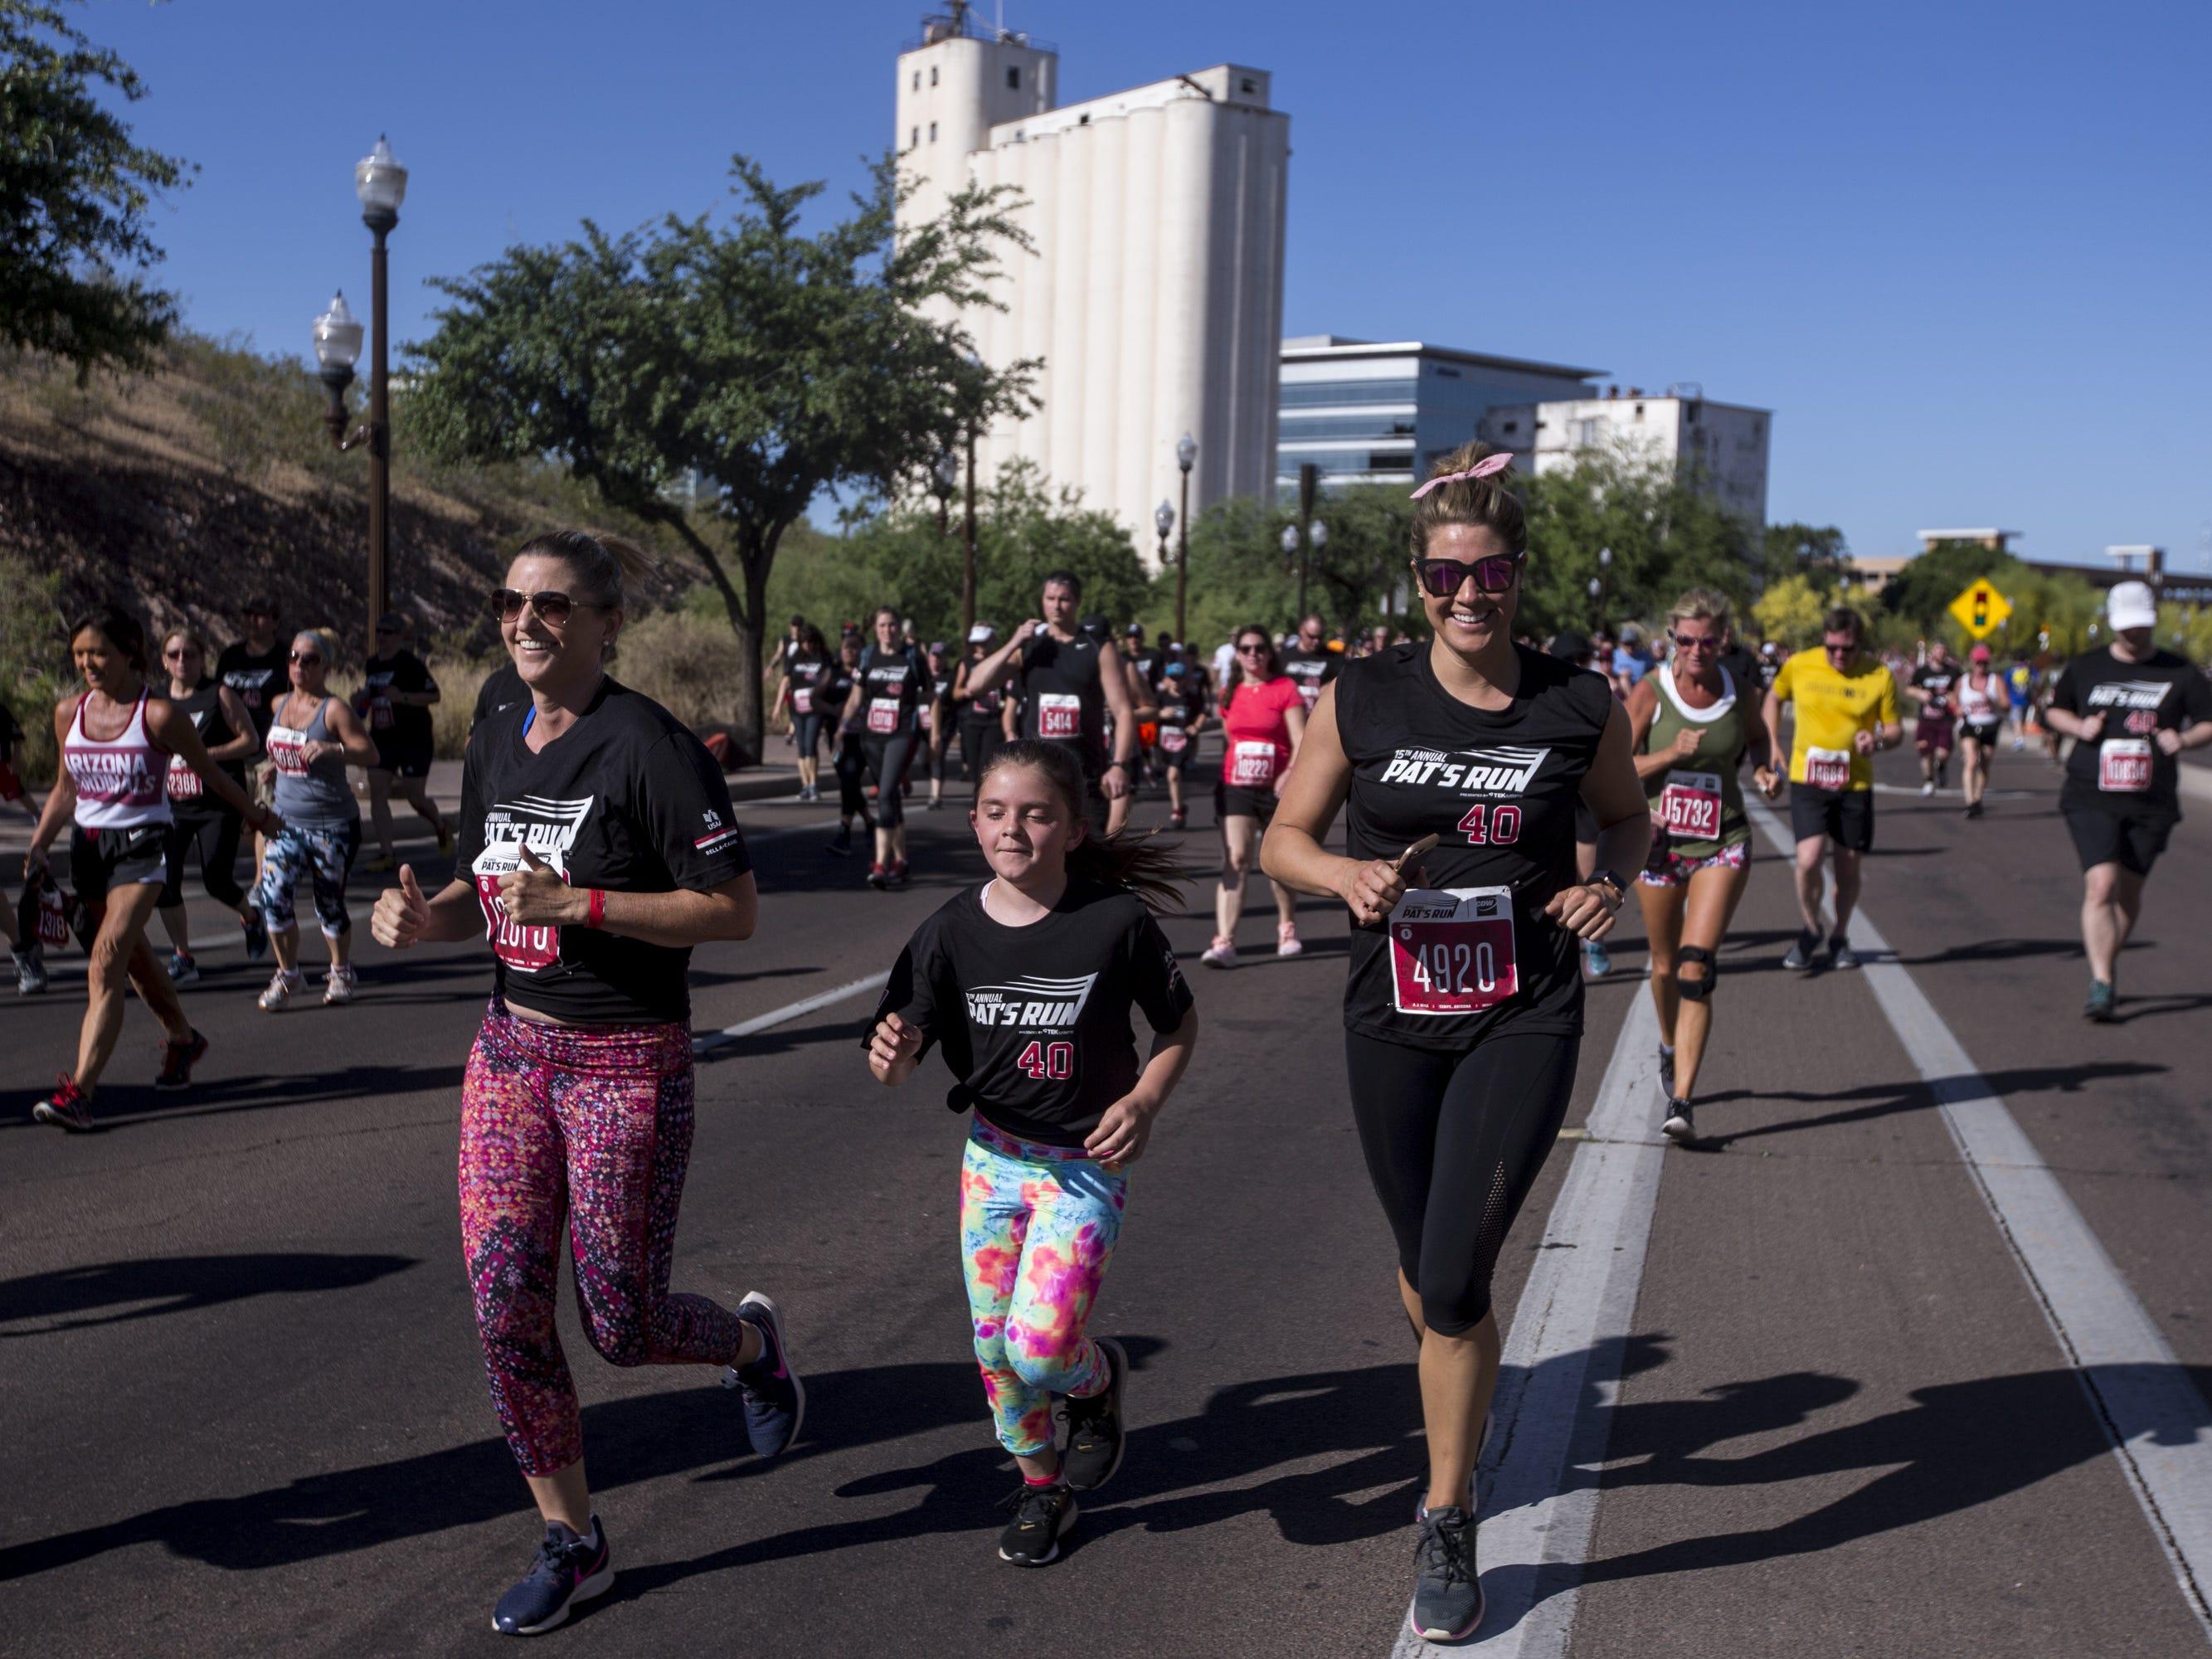 Participants run toward Sun Devil Stadium on Rio Salado Parkway during the 15th Annual Pat's Run on Saturday, April 27, 2019, in Tempe, Ariz.